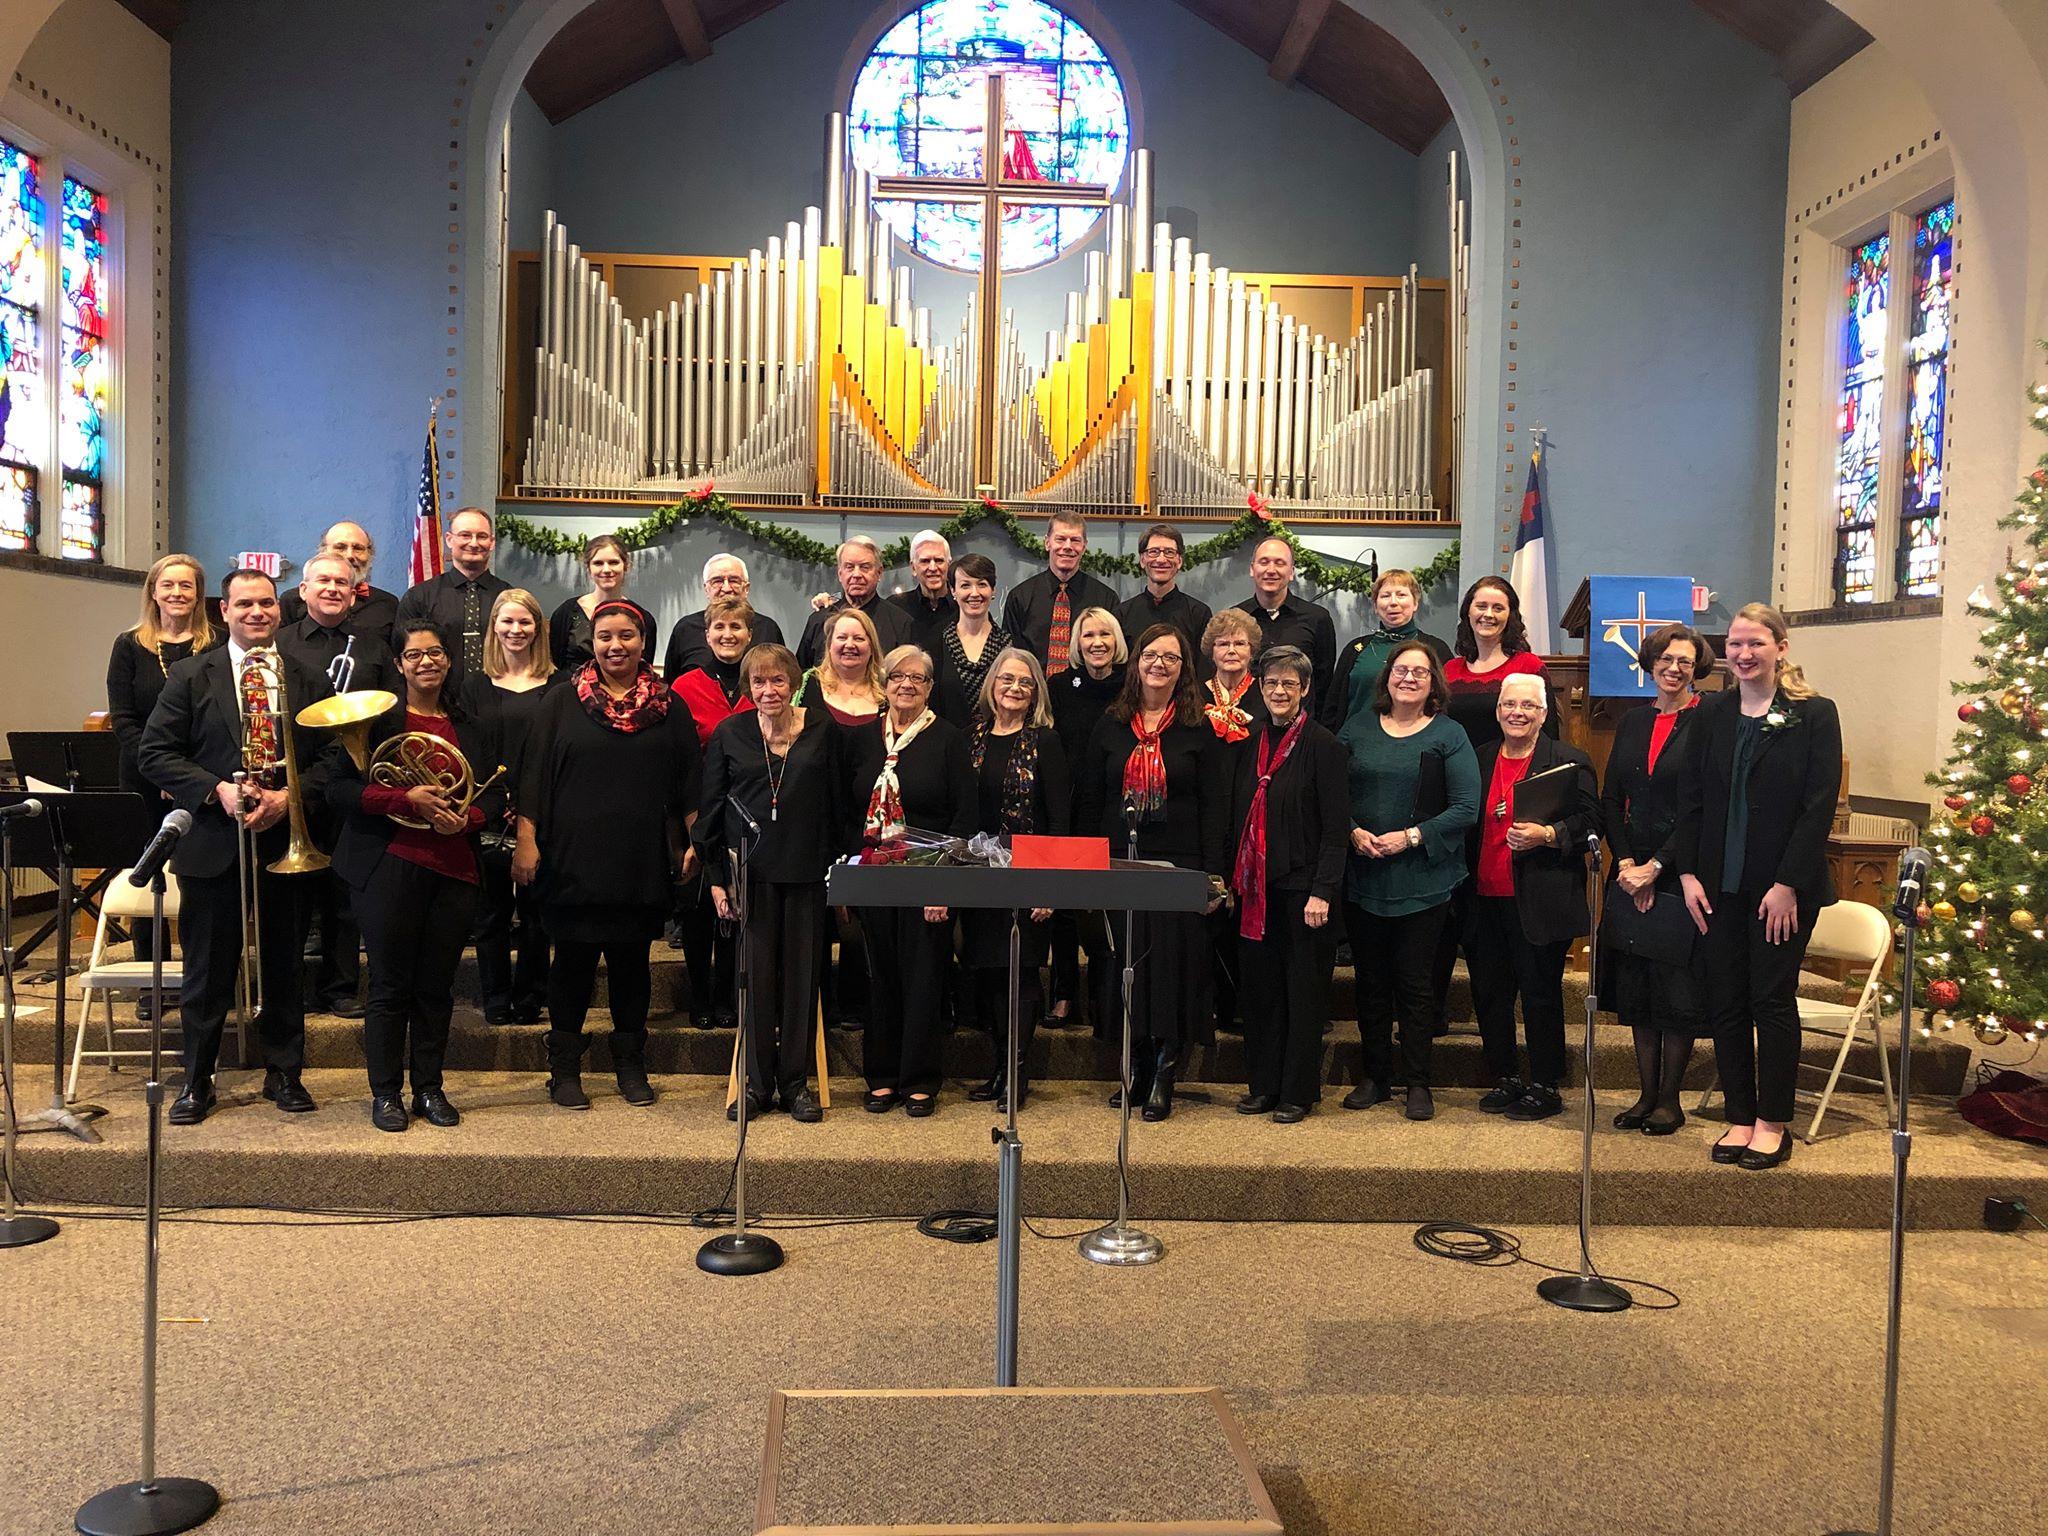 Christmas Cantata 2018